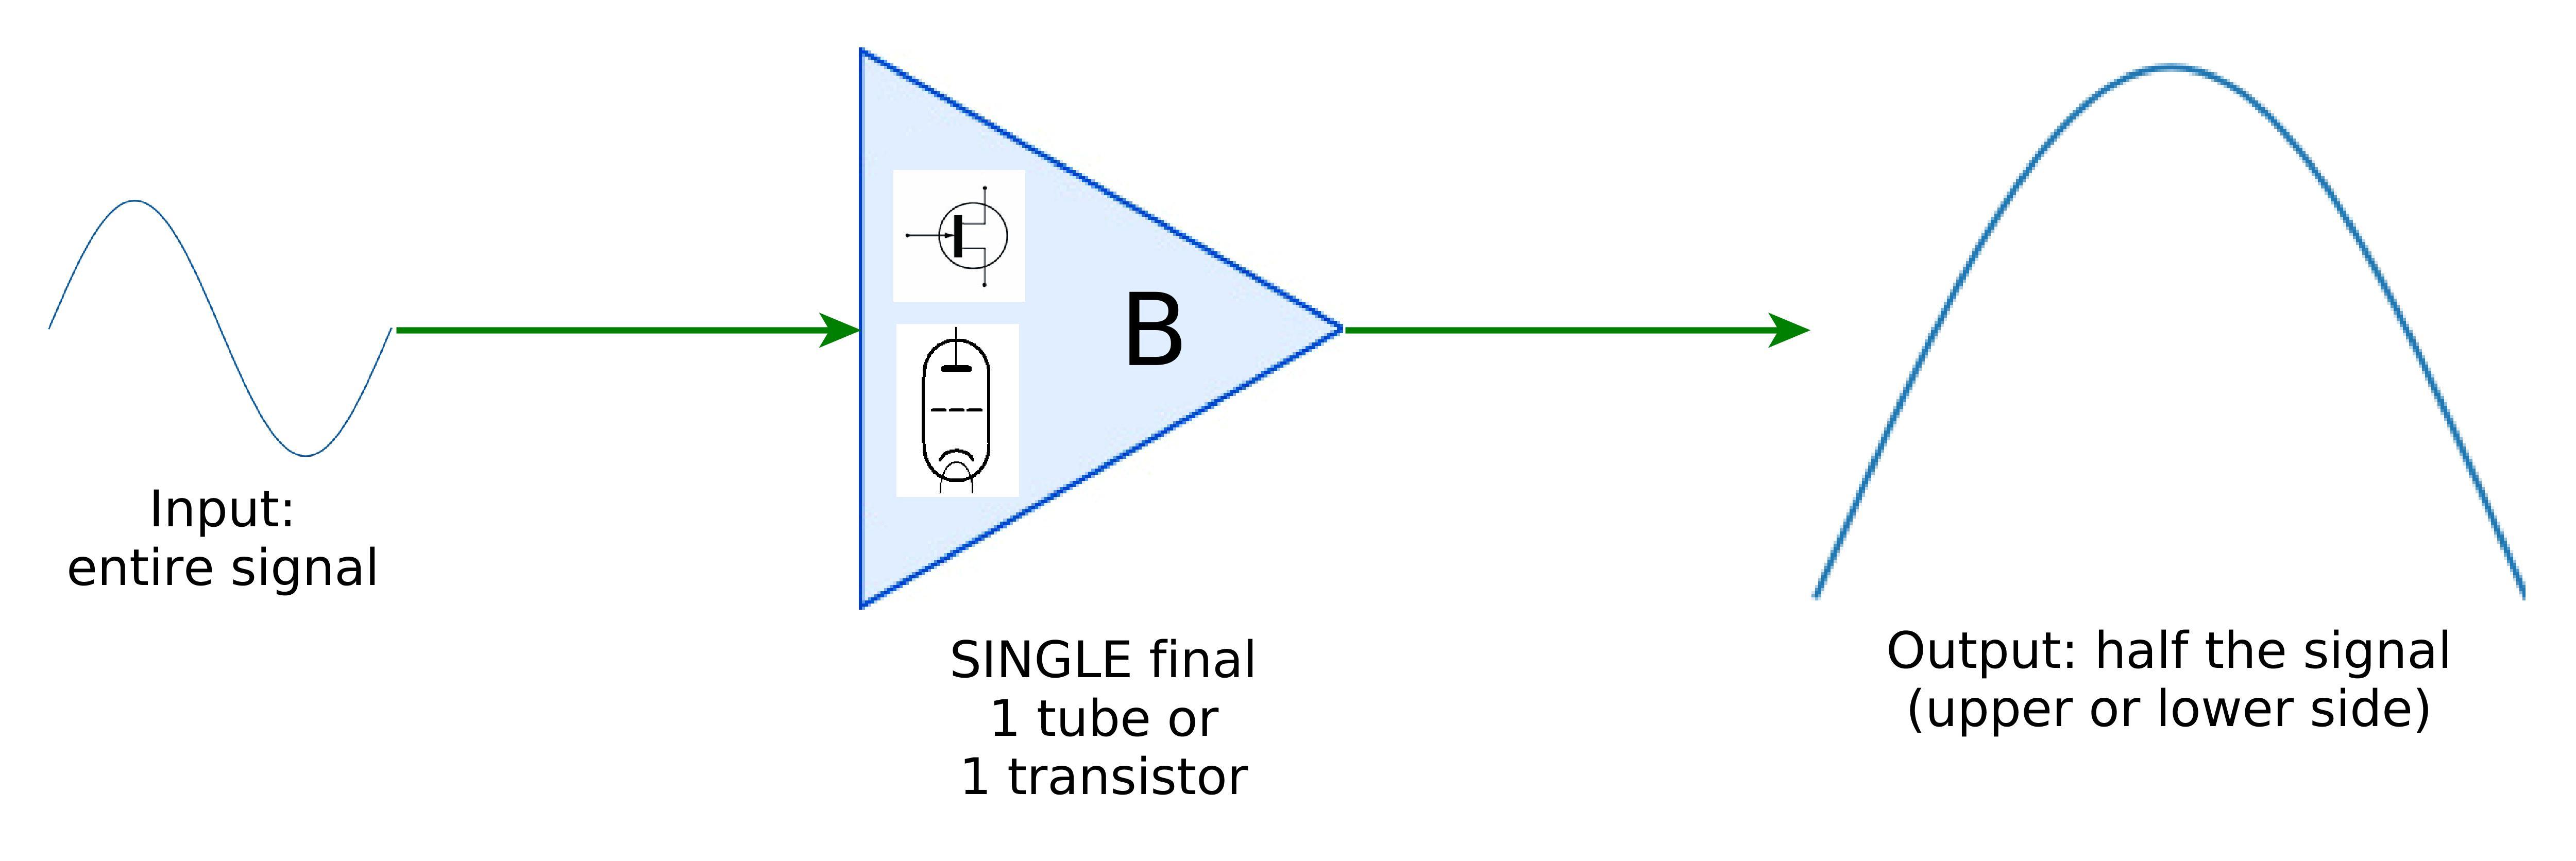 Class B final stage